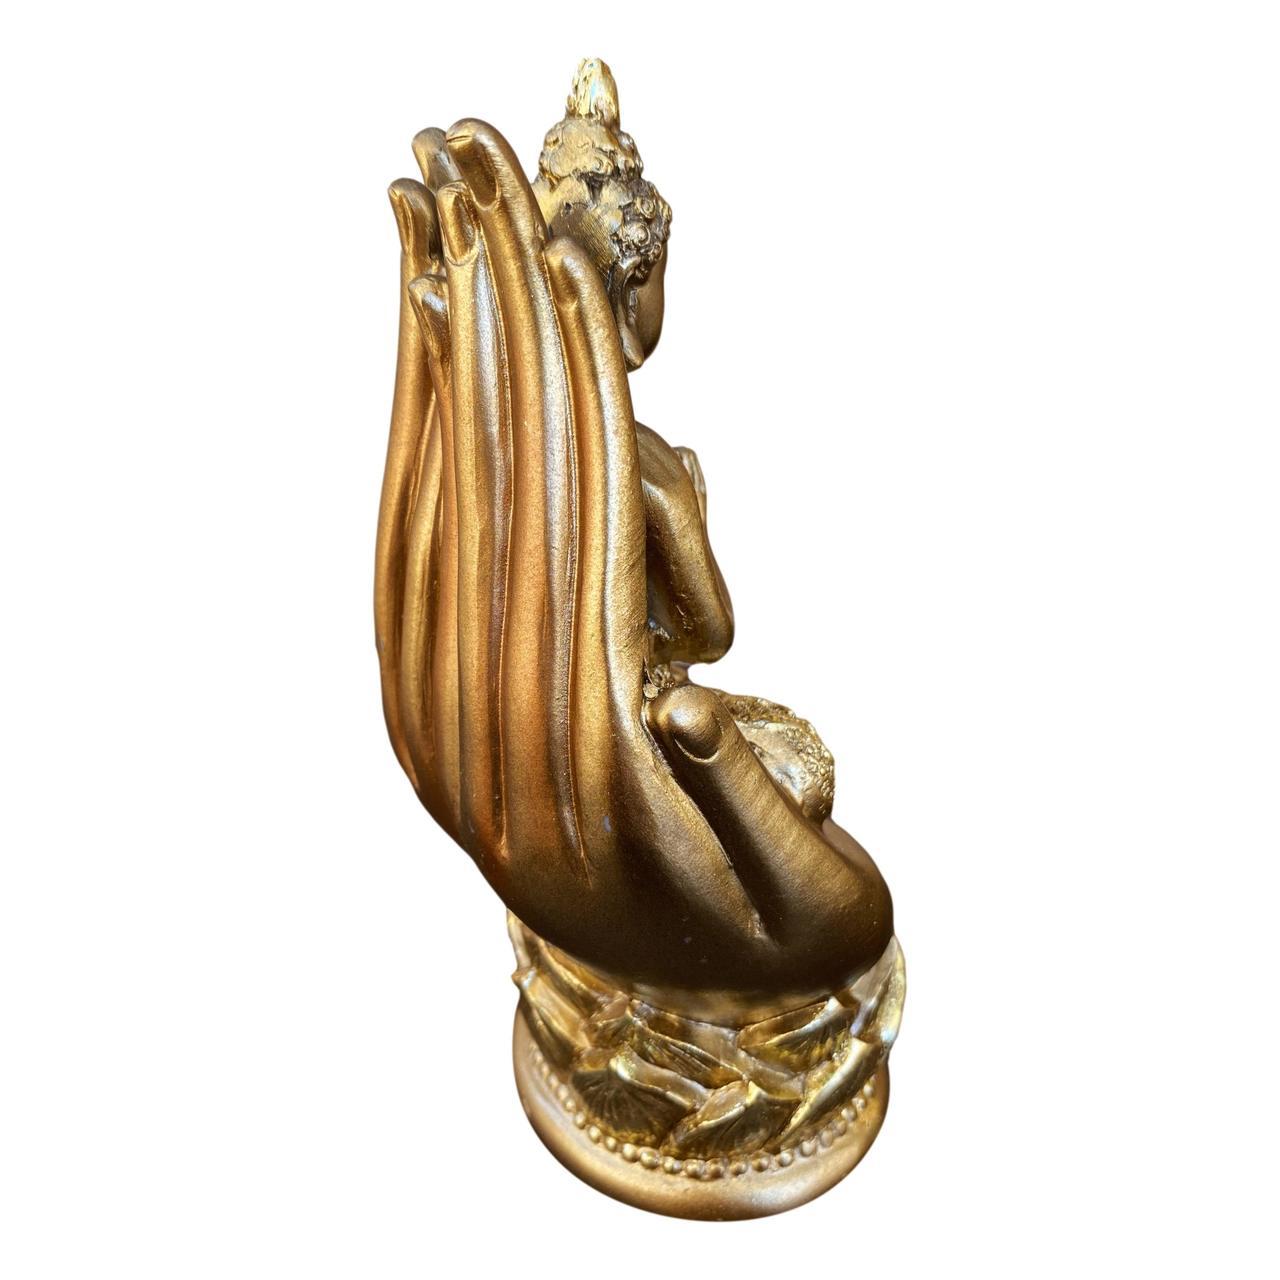 Estatueta Buda (Sidarta Gautama) - 3 Modelos - Resina